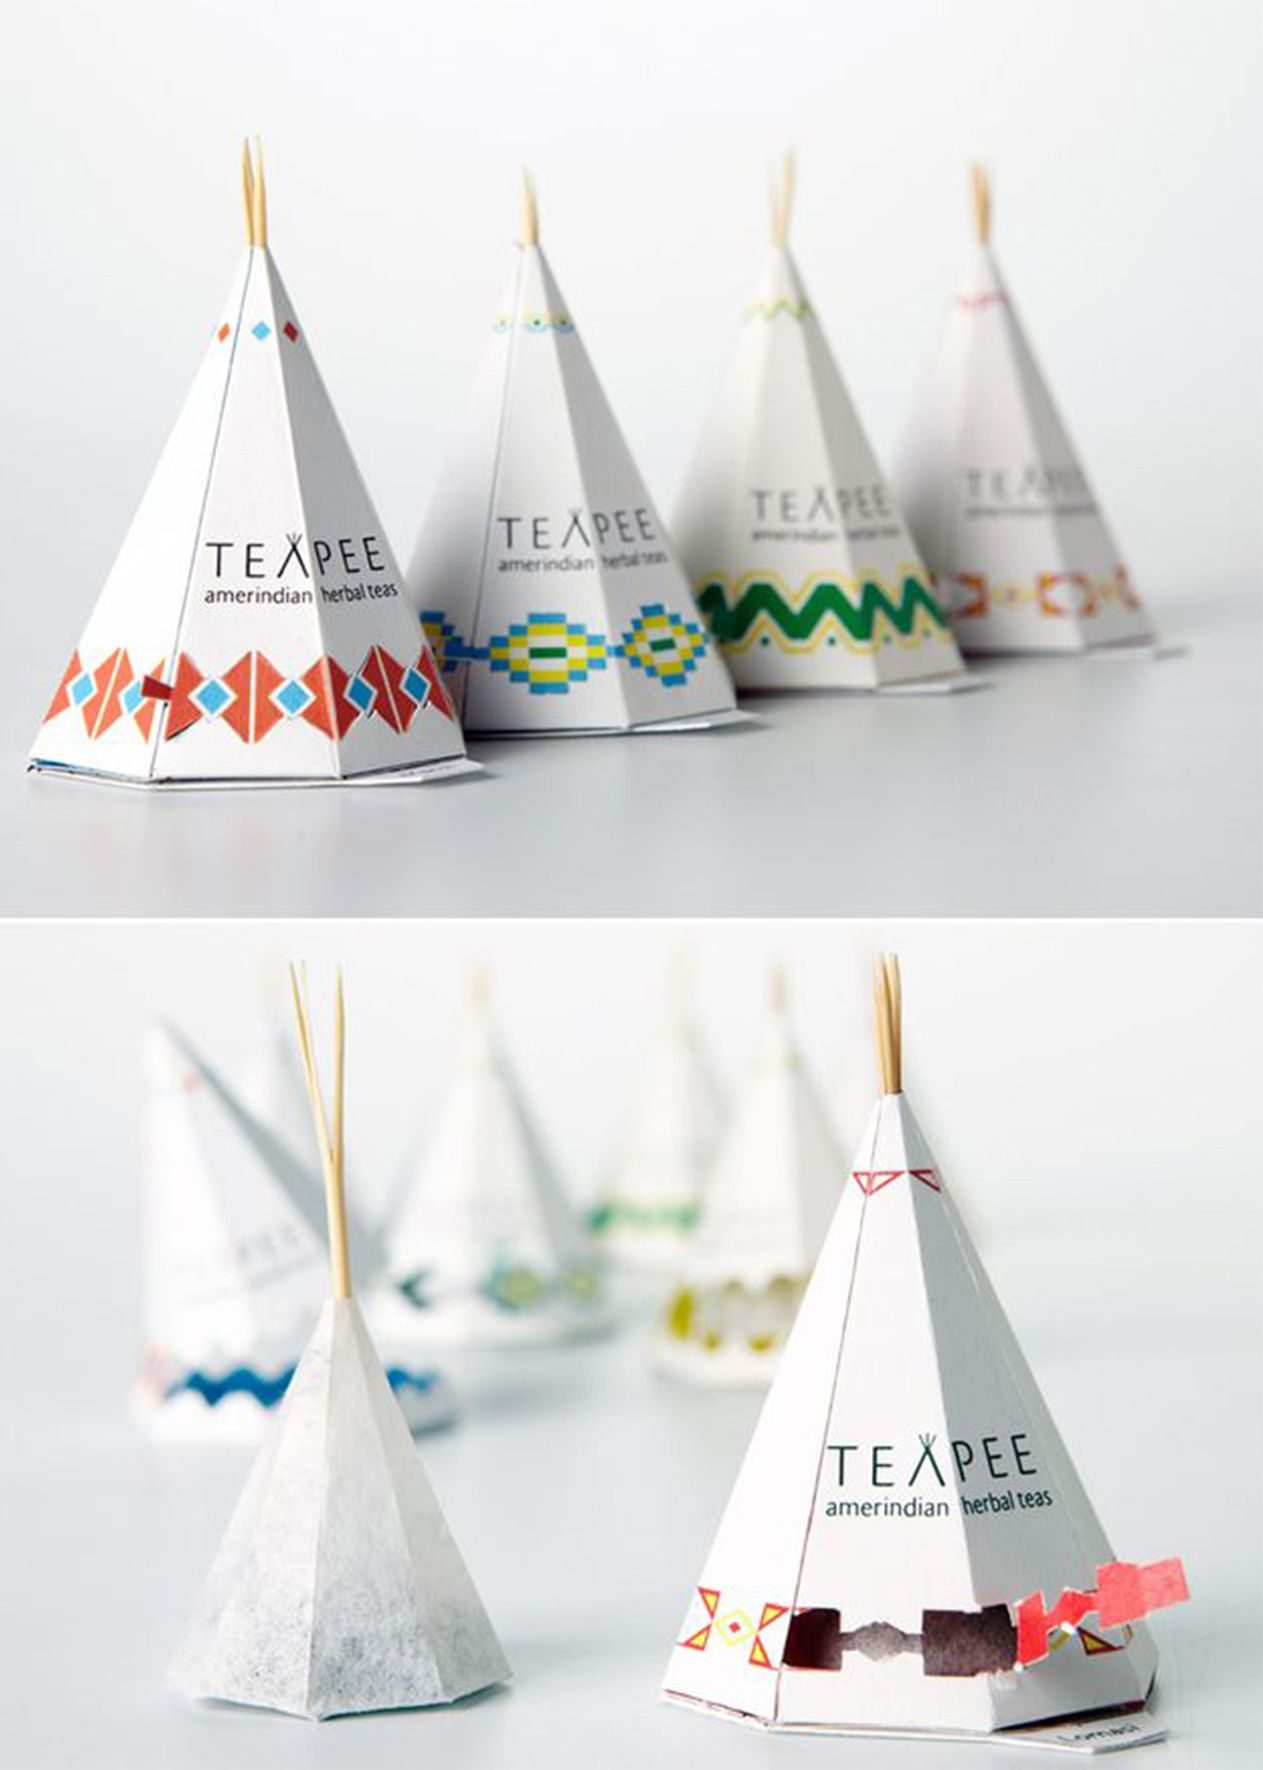 teapee-the.jpg 1 263 × 1 770 pixels